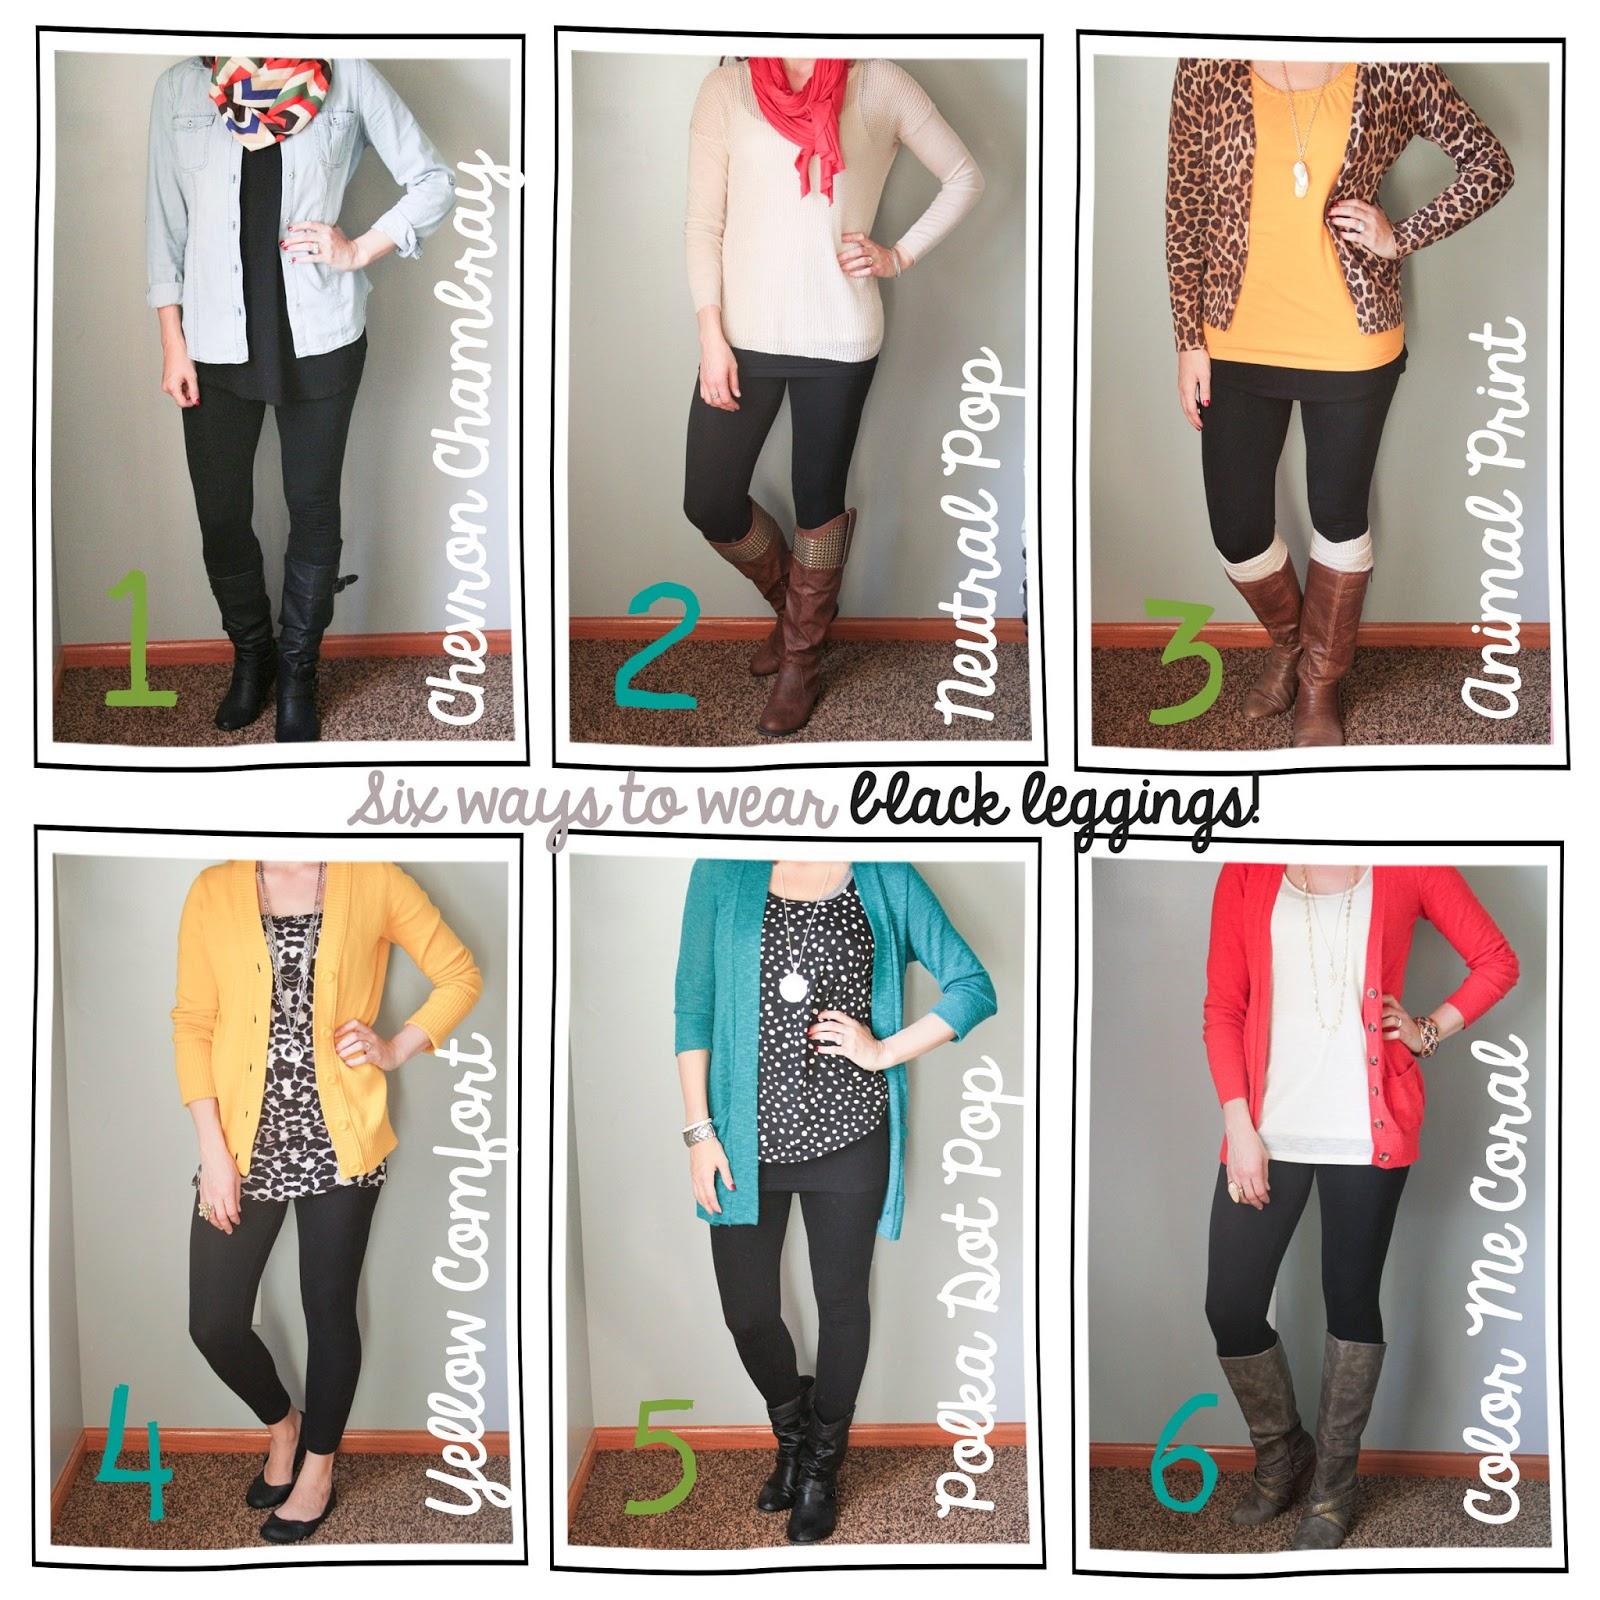 45a08e9f58 Tutor My Style  Six Ways to Style...Black leggings!